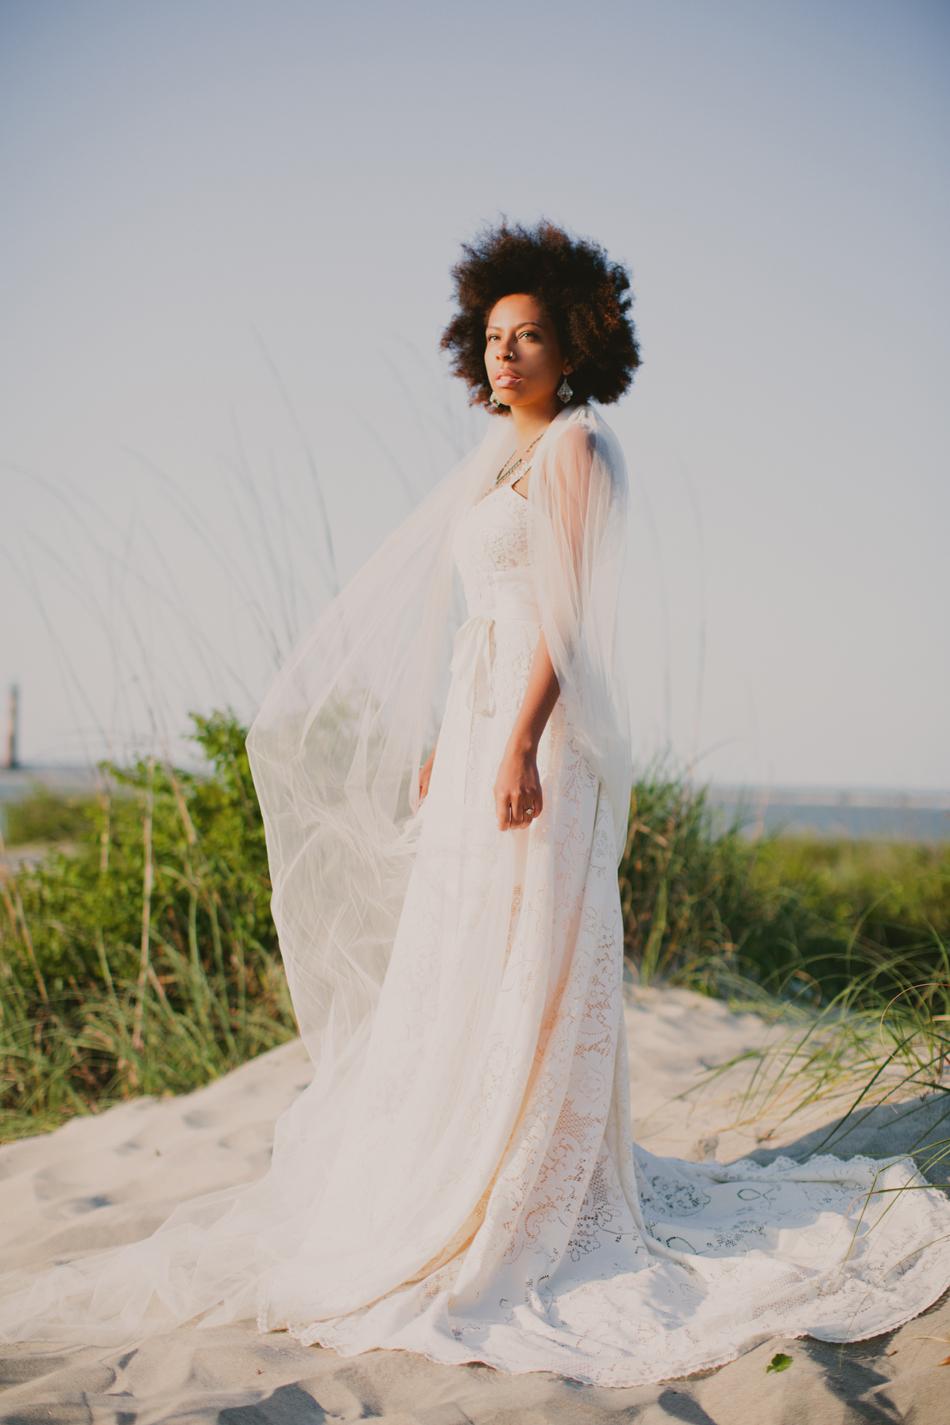 Jameykay_arlie_bohemian_elopement_styled_shoot024.jpg